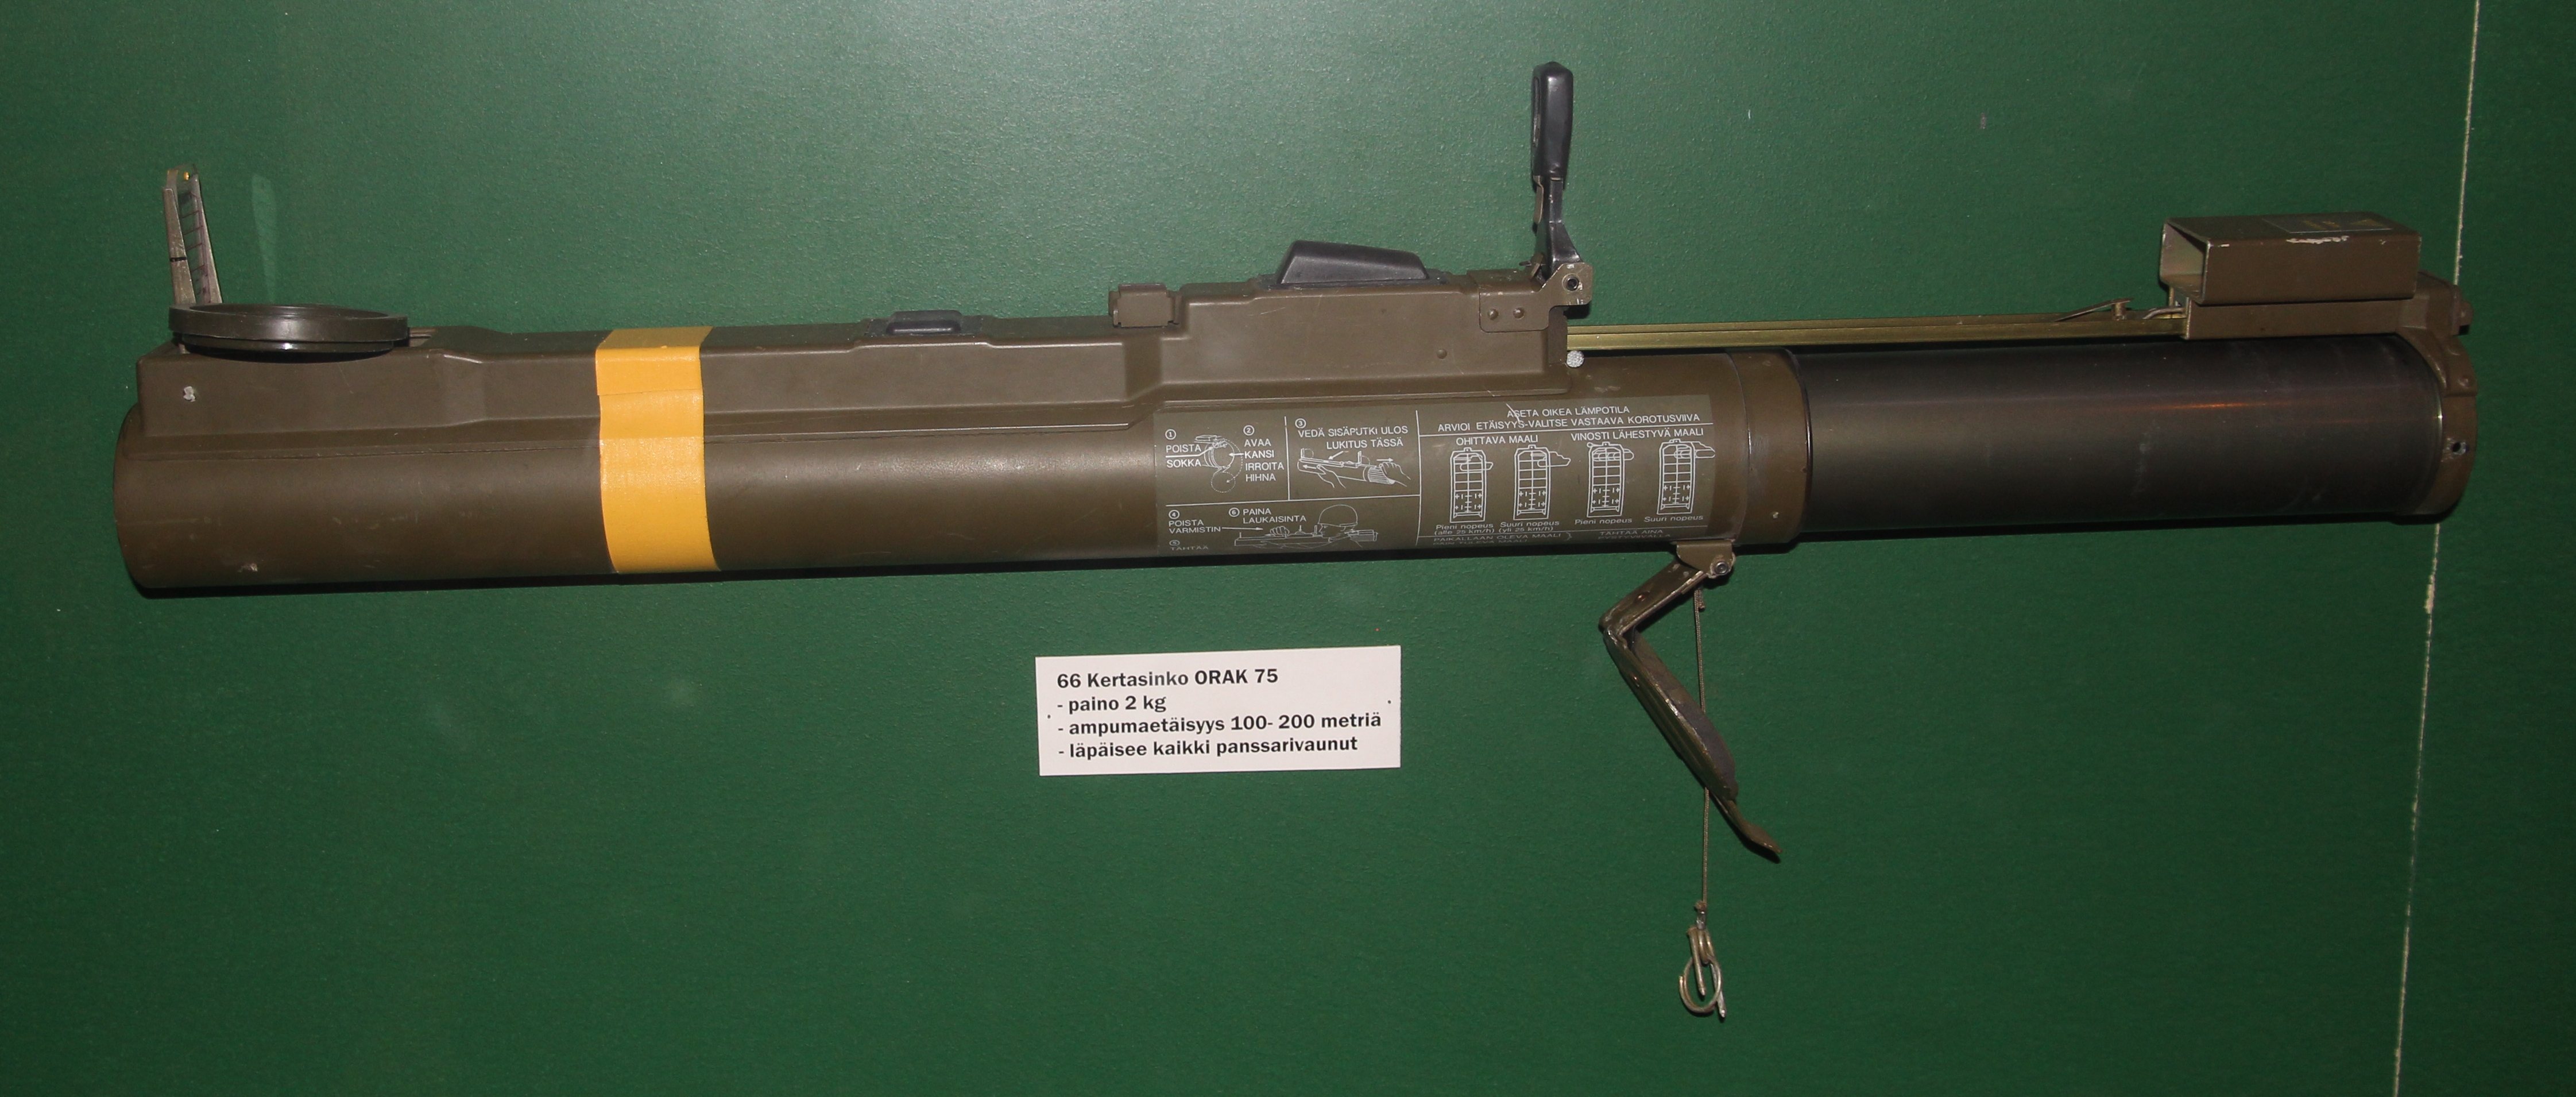 List of rocket launchers | Wiki | Everipedia